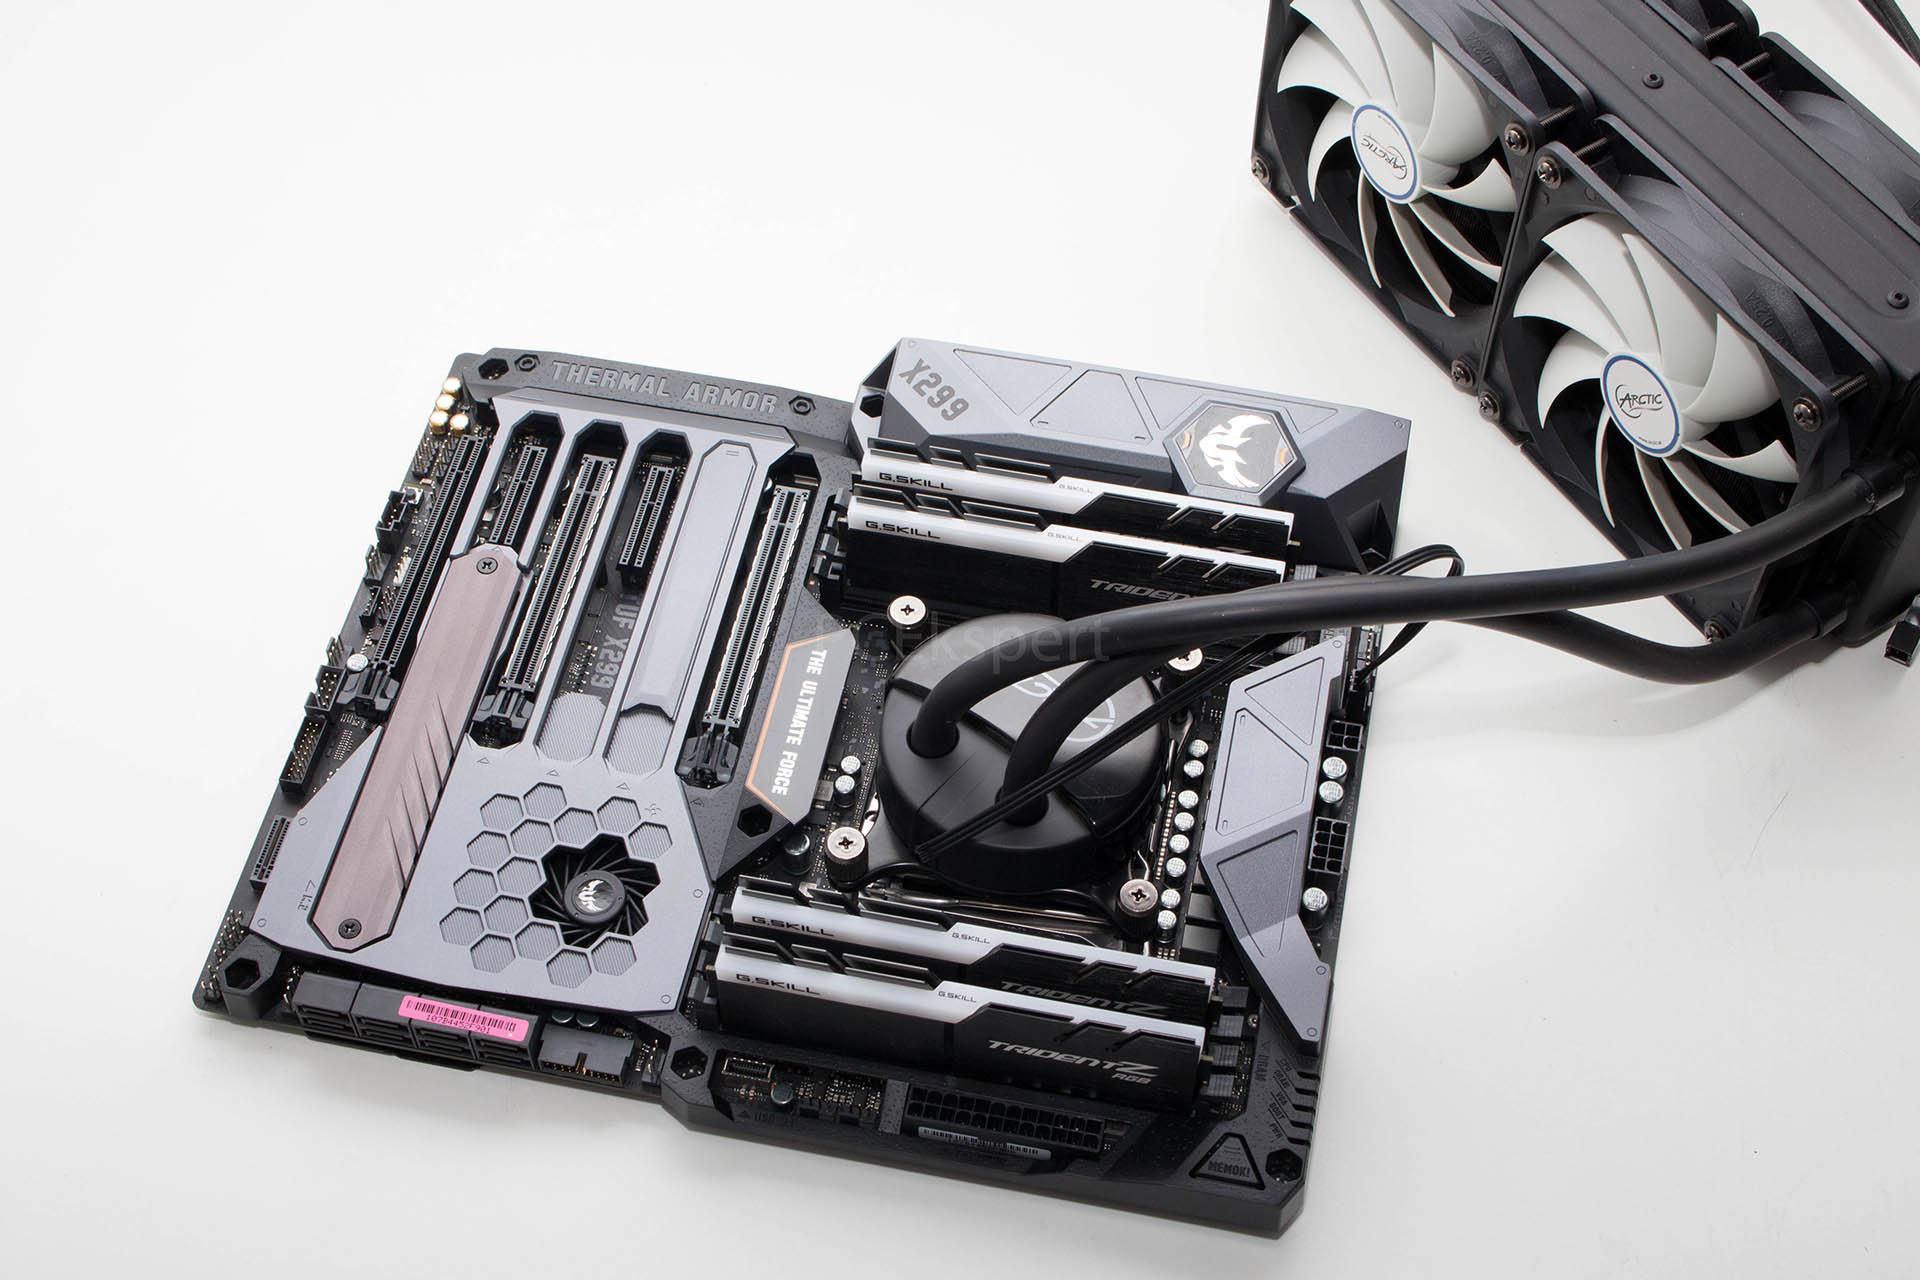 Brzi test – ASRock X299 Gaming i9, ASUS TUF X299 Mark I & STRIX X299-E Gaming